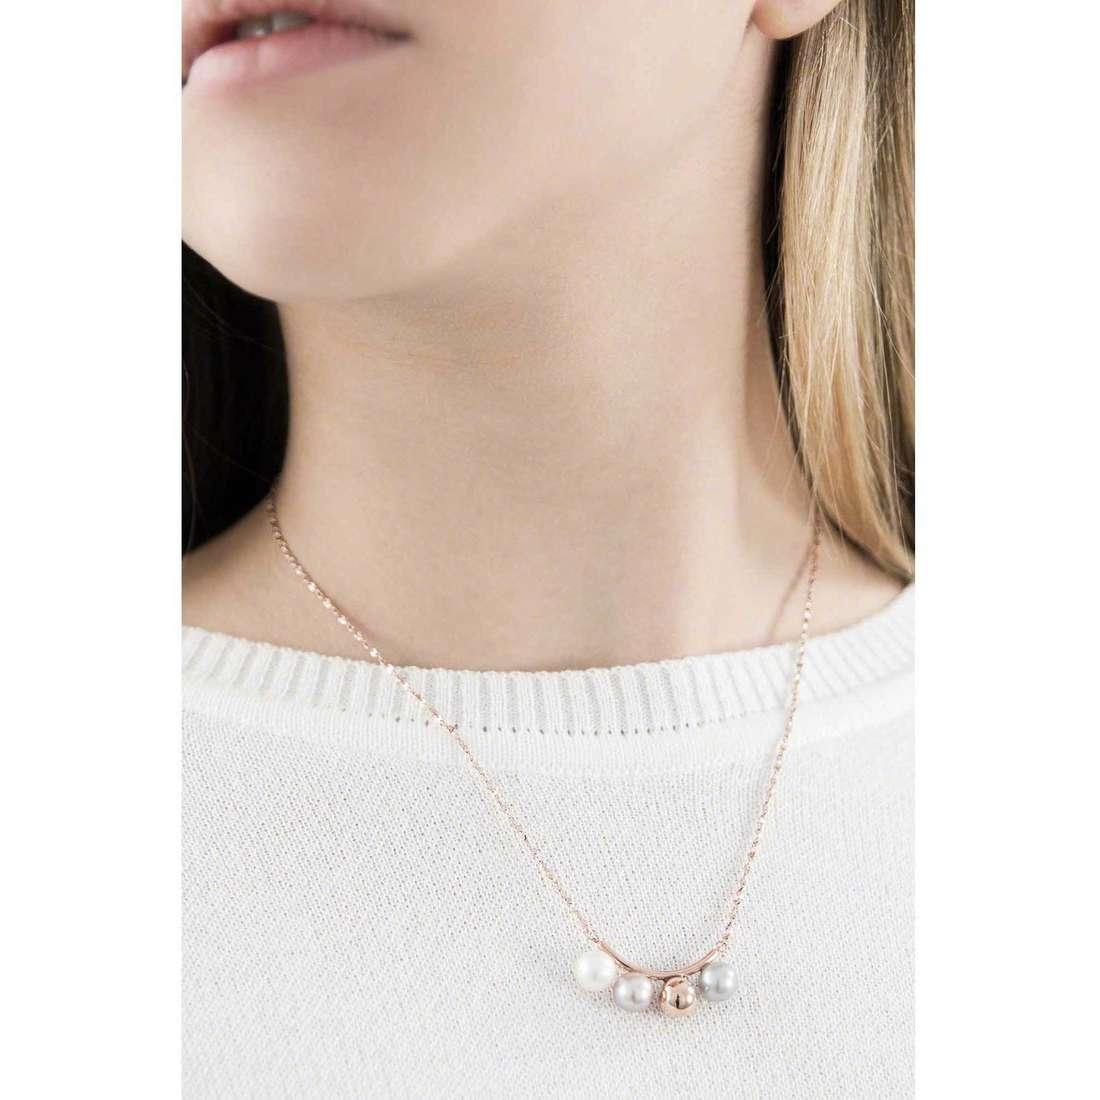 Morellato colliers Lunae femme SADX01 indosso